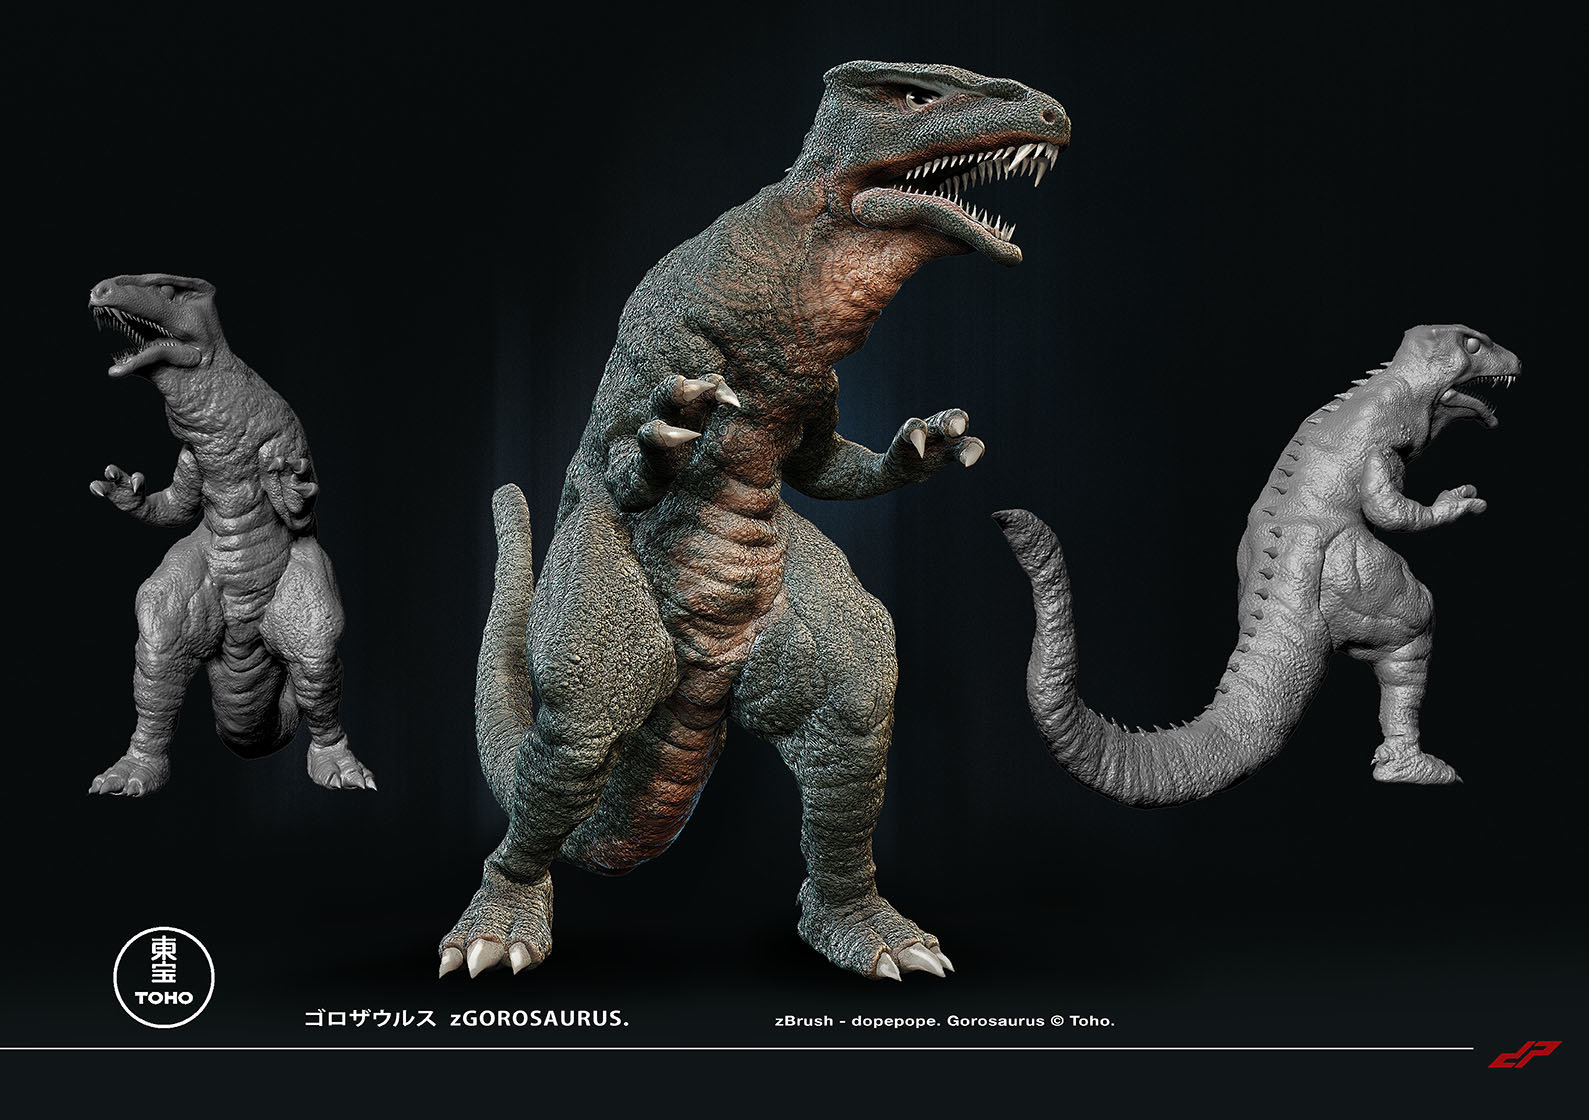 Dope pope zgorosaurus by dopepope d6tiw11